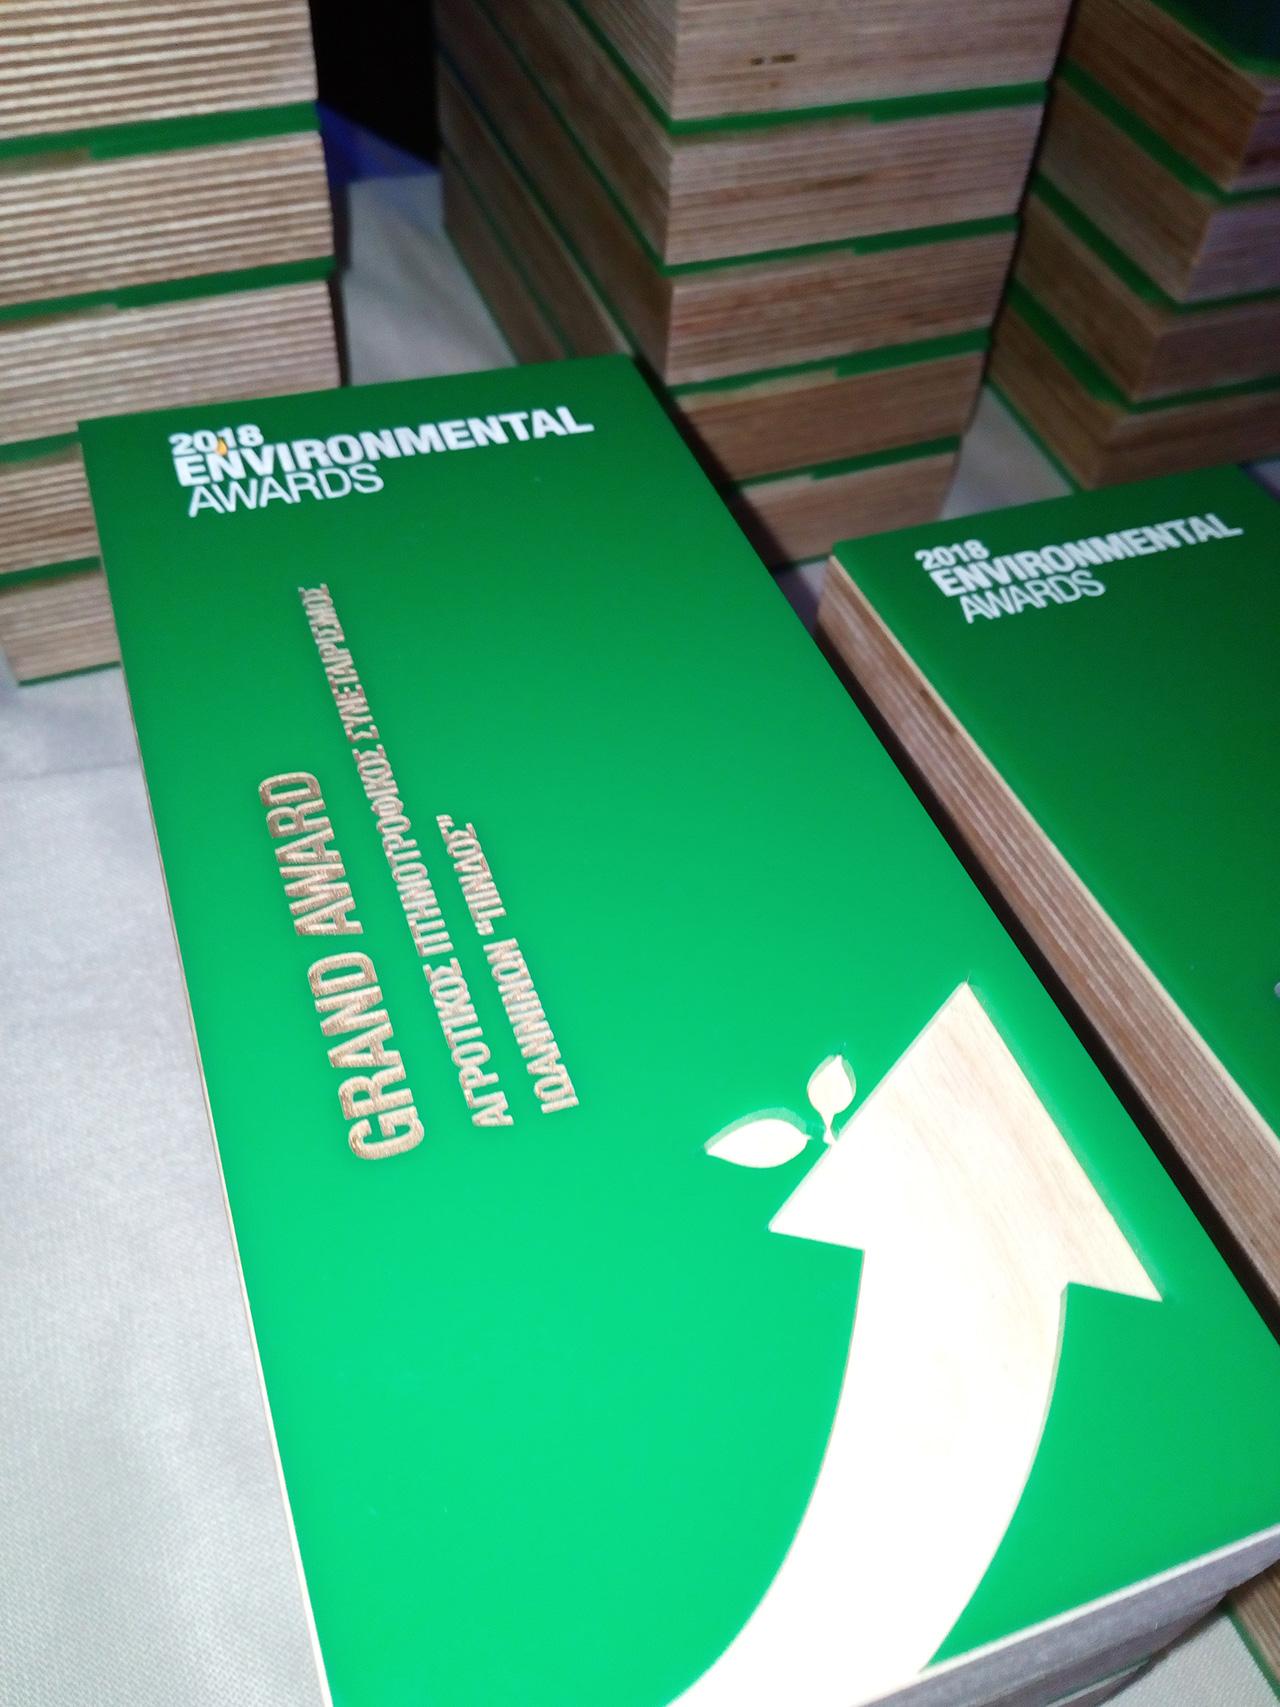 Environmental awards που δόθηκαν στο Κτήμα Αριάδνη